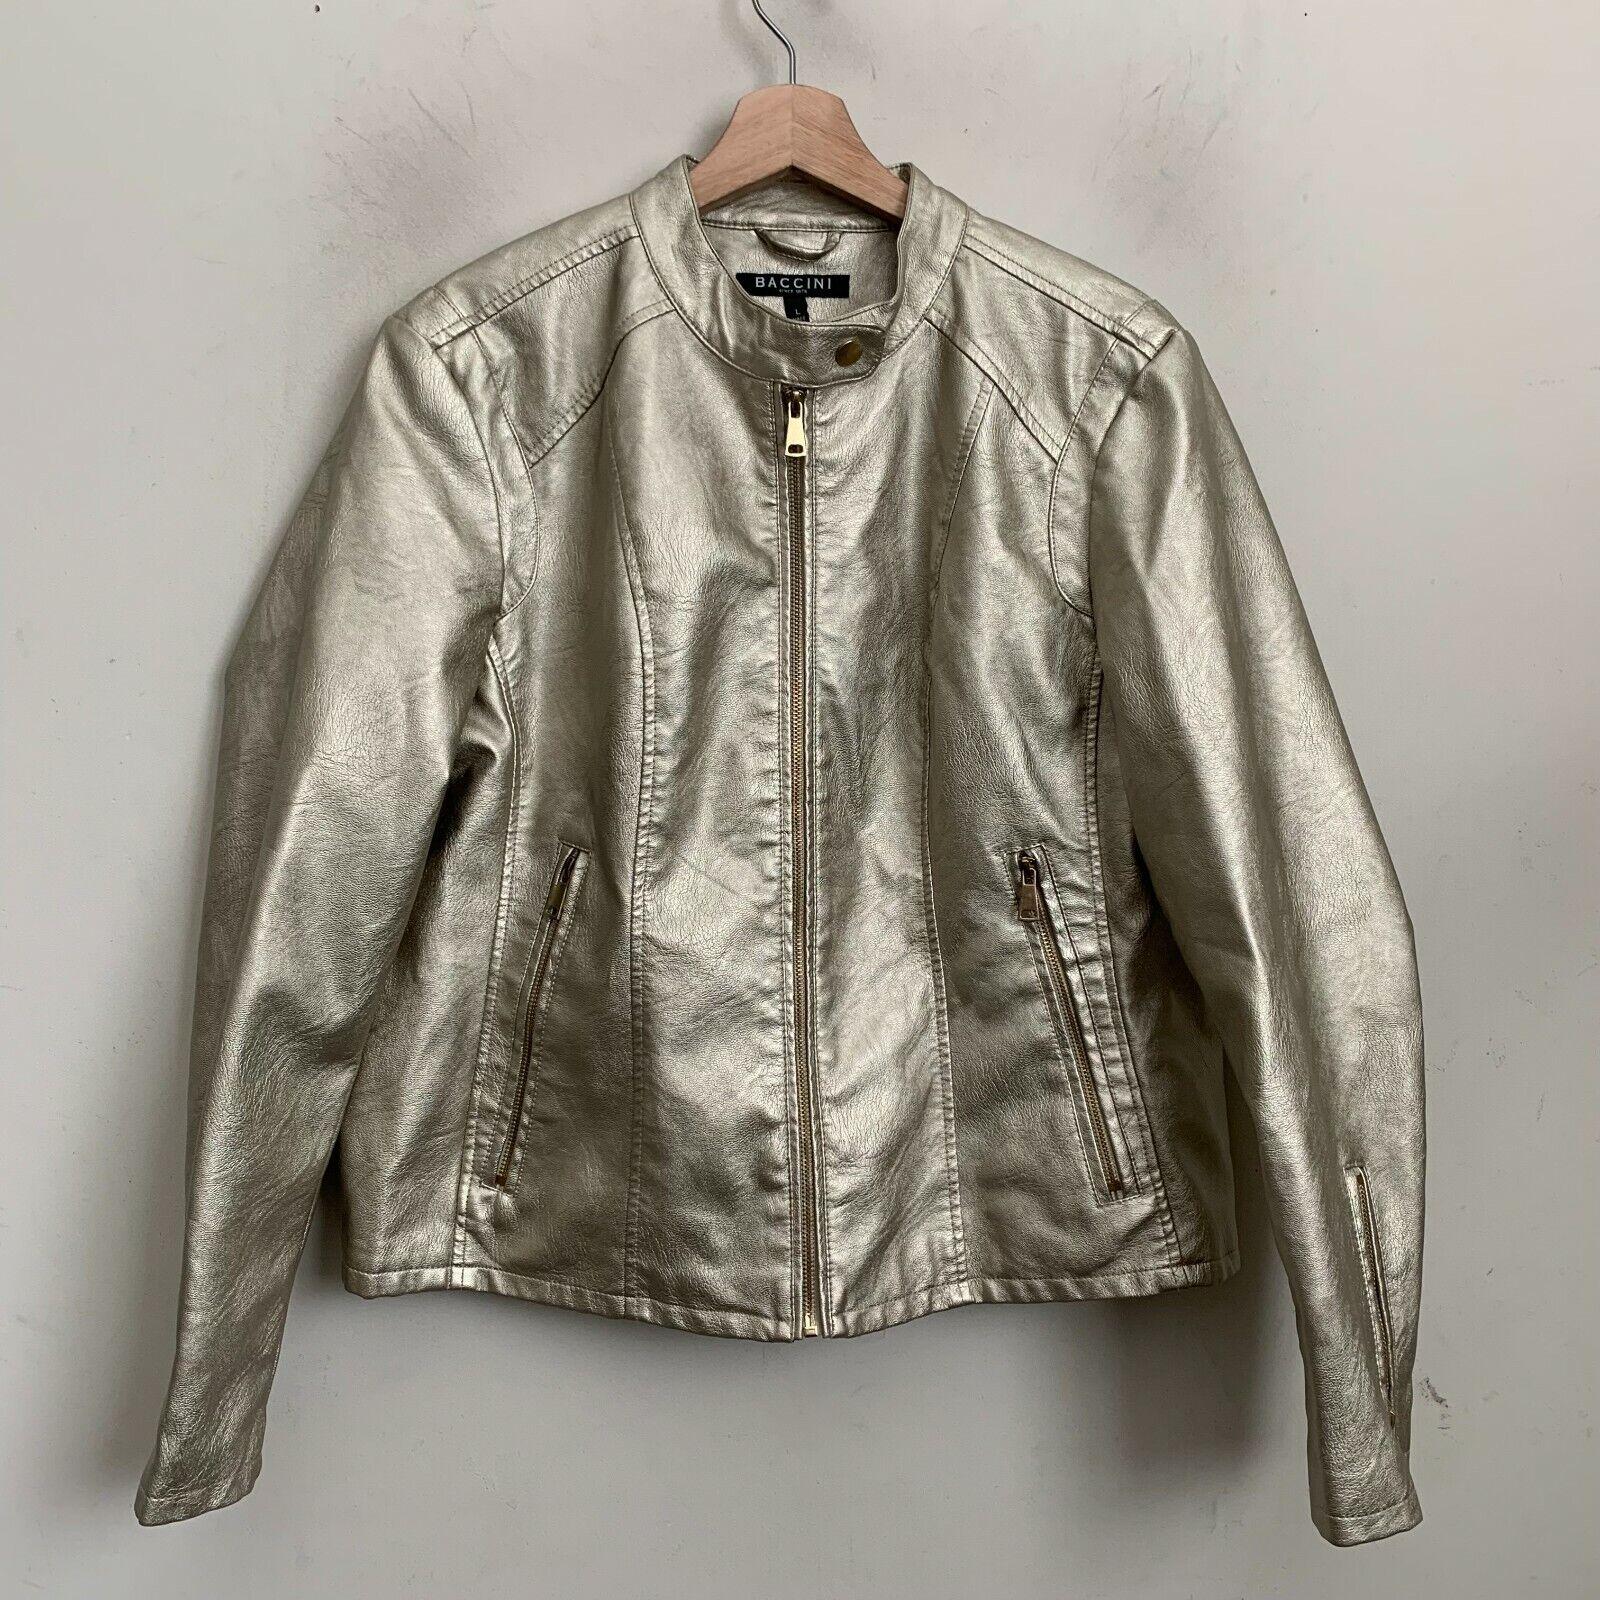 Baccini Womens Jacket Biker Moto Gold Faux Leather Zip Pockets Lined Size L